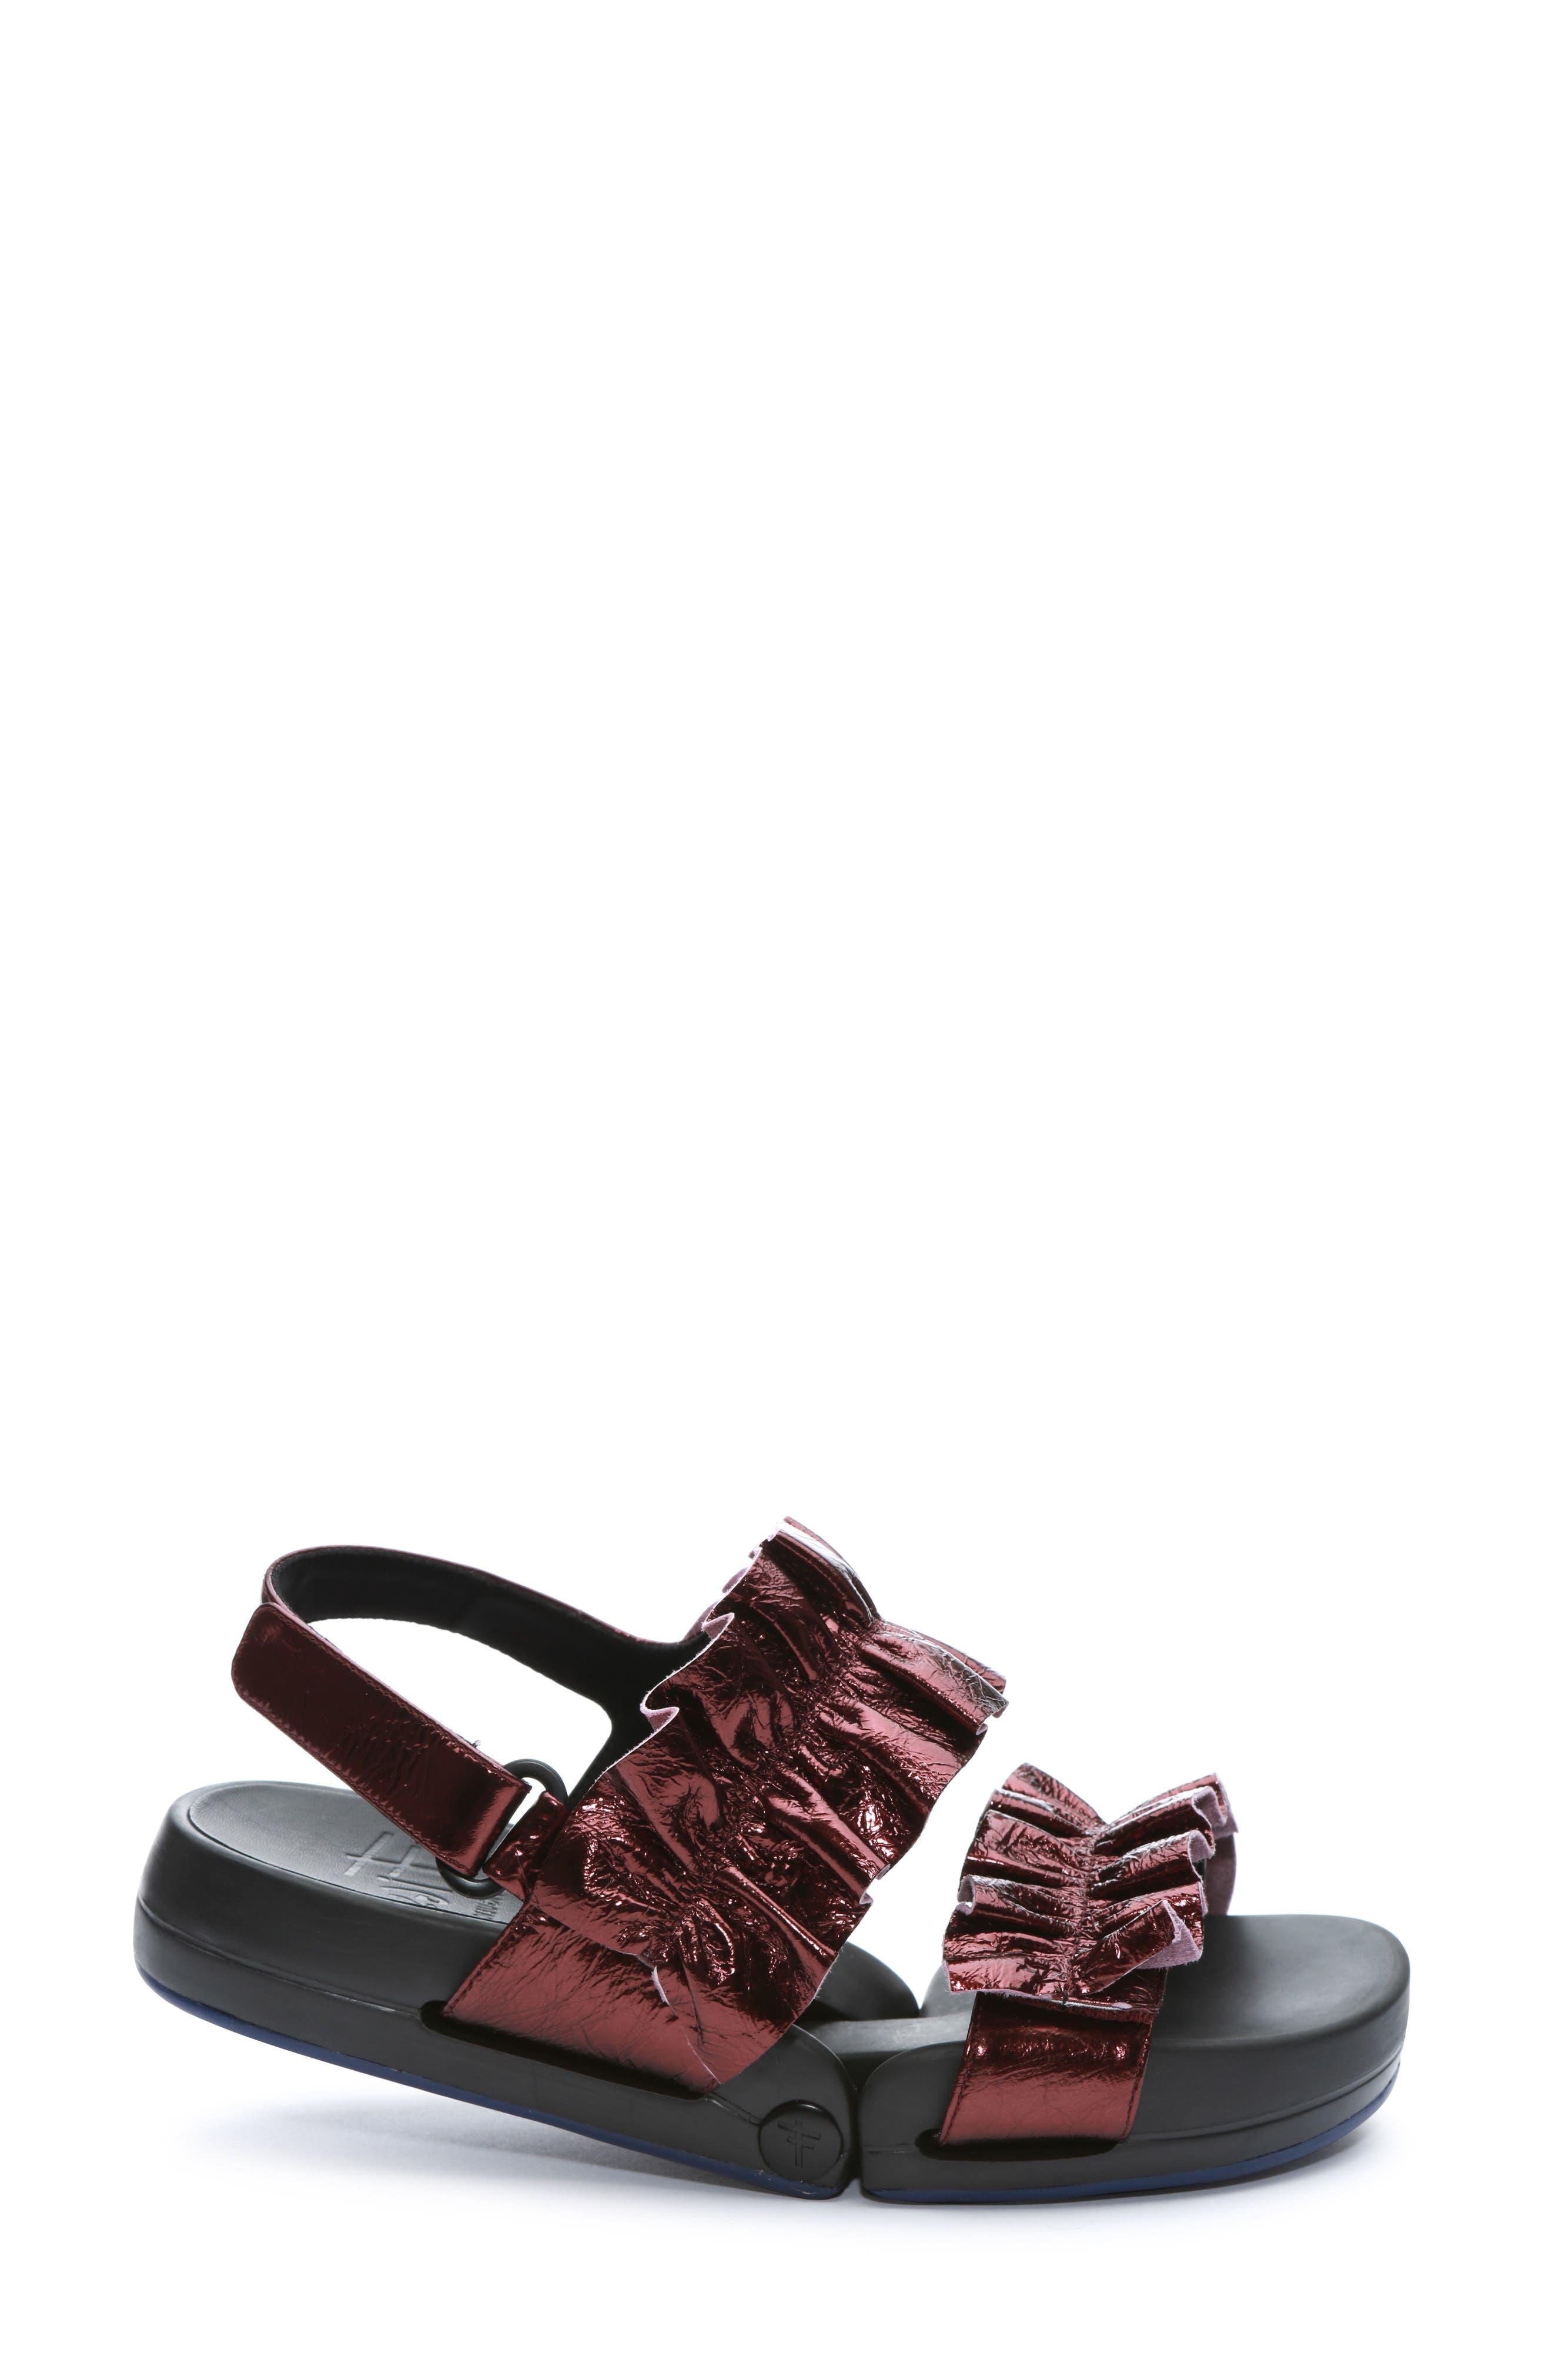 Figulous Ruffle Sandal,                             Alternate thumbnail 3, color,                             BORDEAUX METALLIC LEATHER